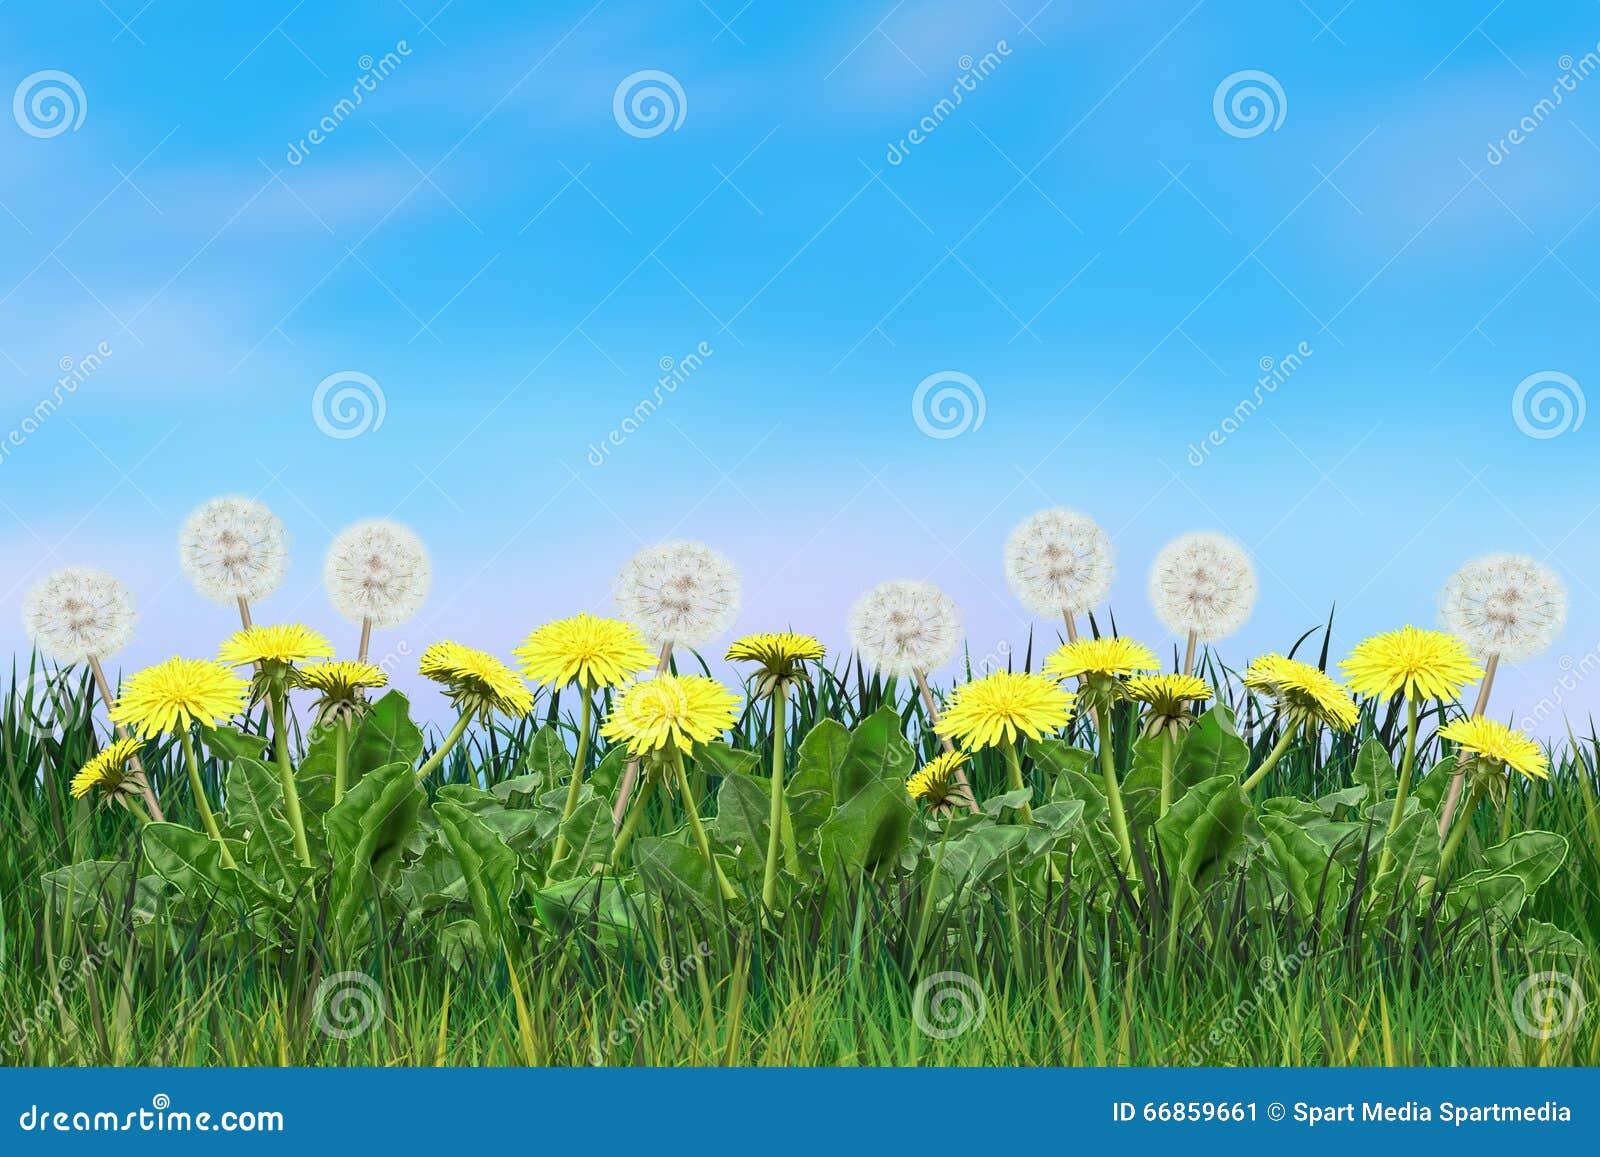 Download Dandelion Flowers Sunny Day Blowball Floral Landscape Stock Illustration - Illustration of beauty, morning: 66859661